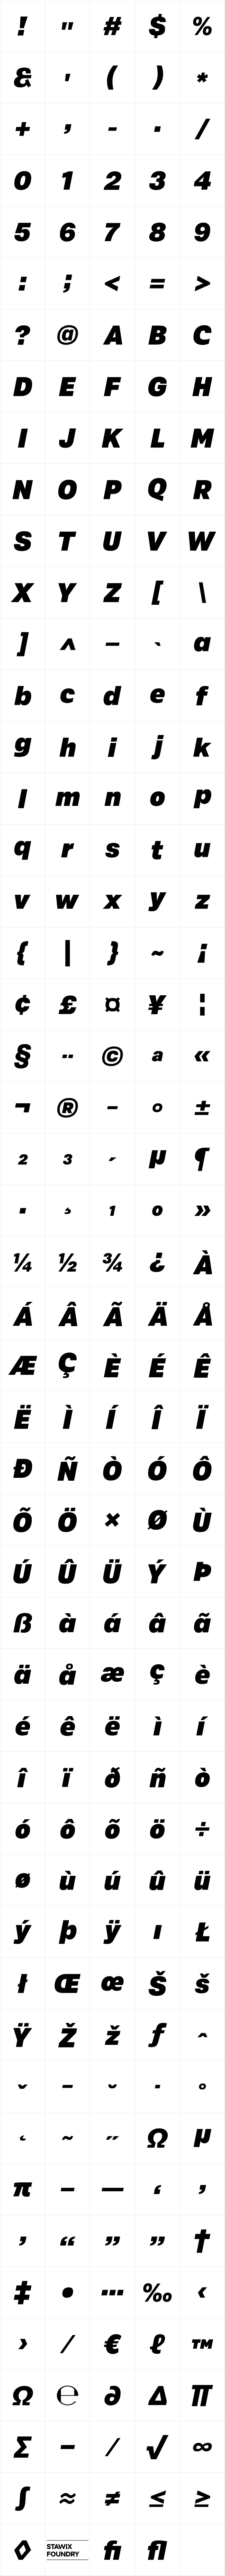 Crique Grotesk Black Italic